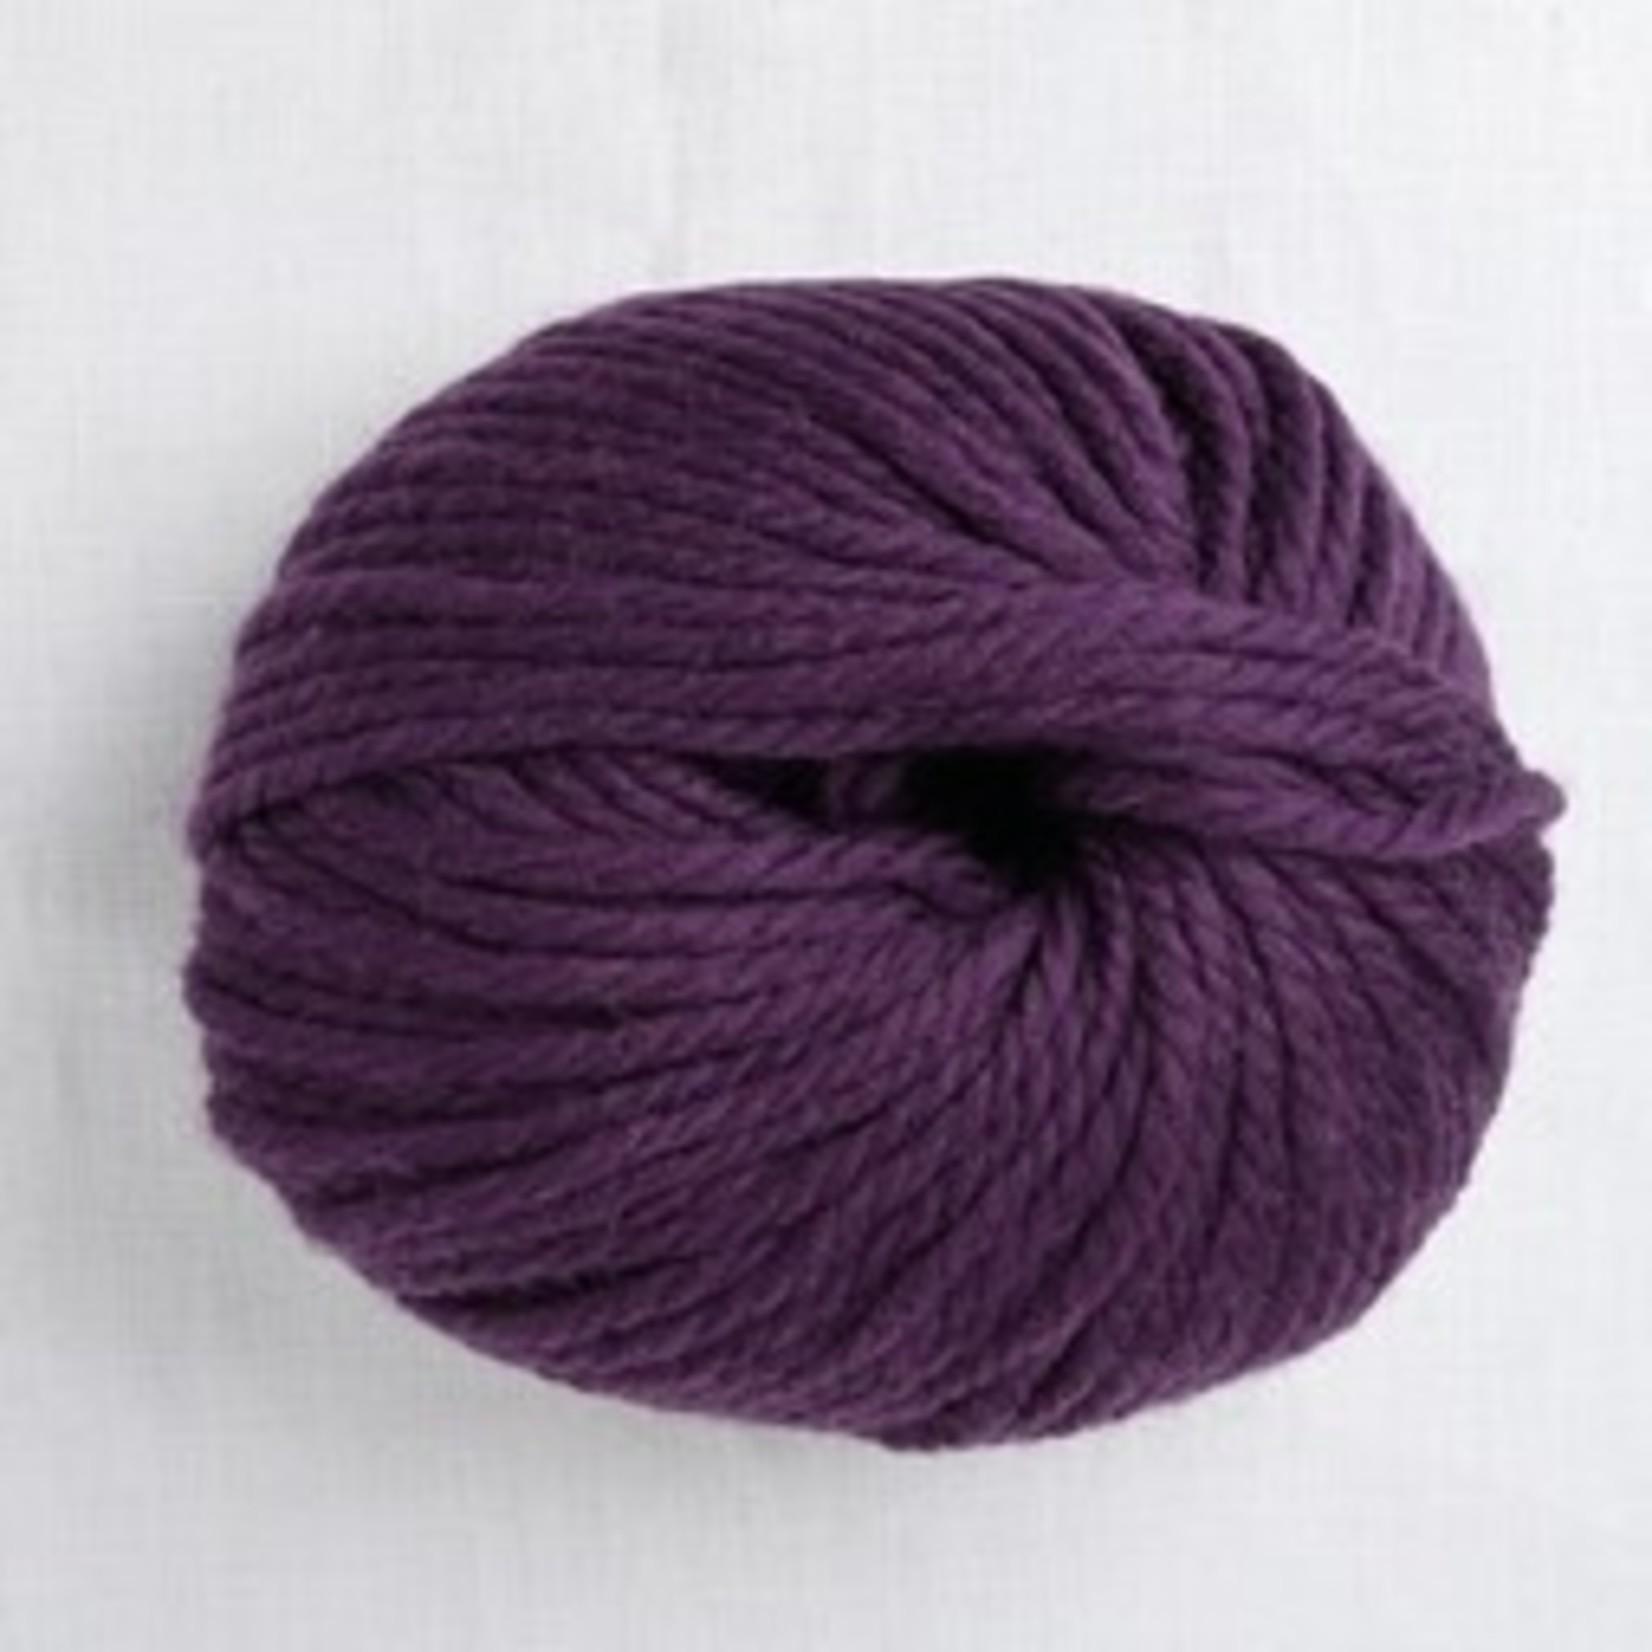 Sirdar Spinning Big Wool, 025, Wild Berry